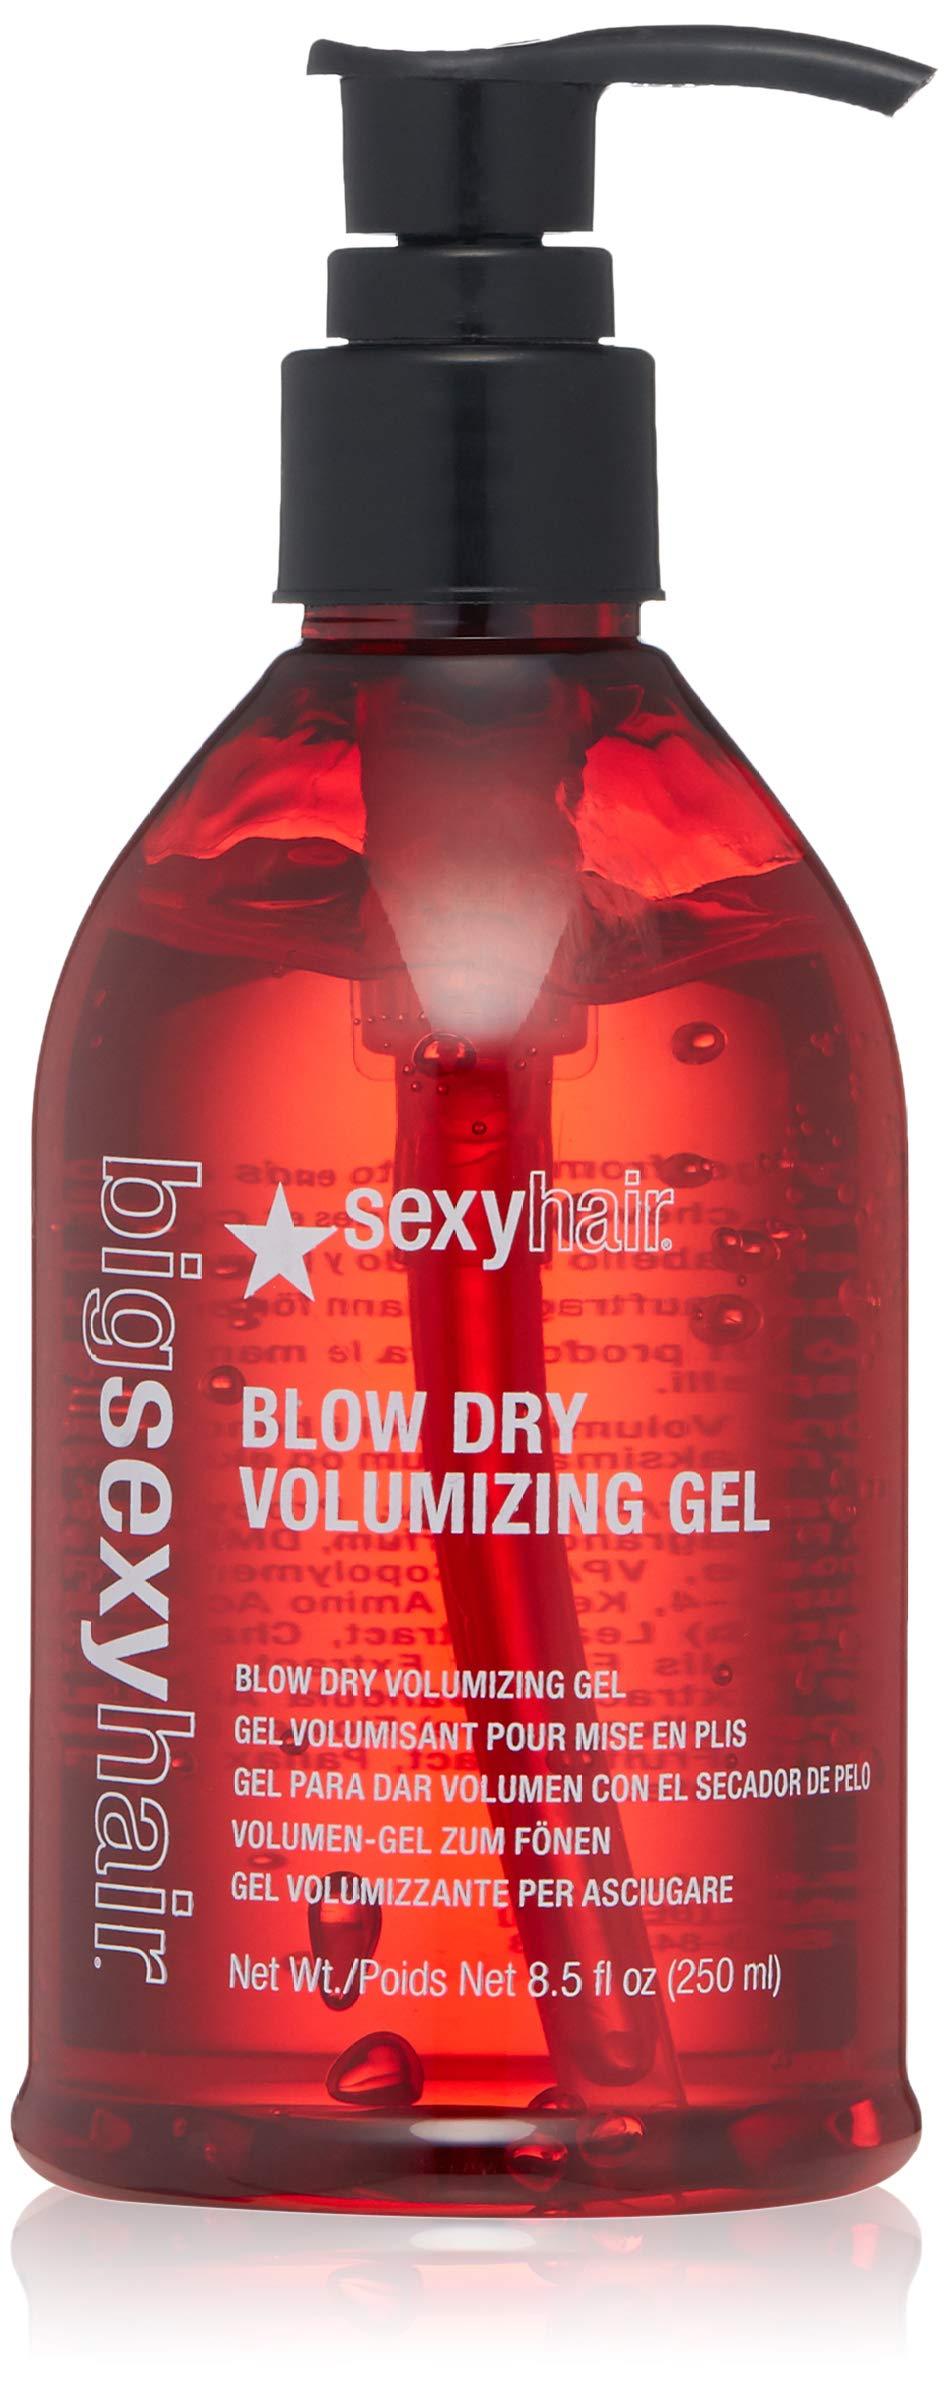 SEXYHAIR Big Blow Dry Volumizing Gel, 8.5 Fl Oz by SEXYHAIR